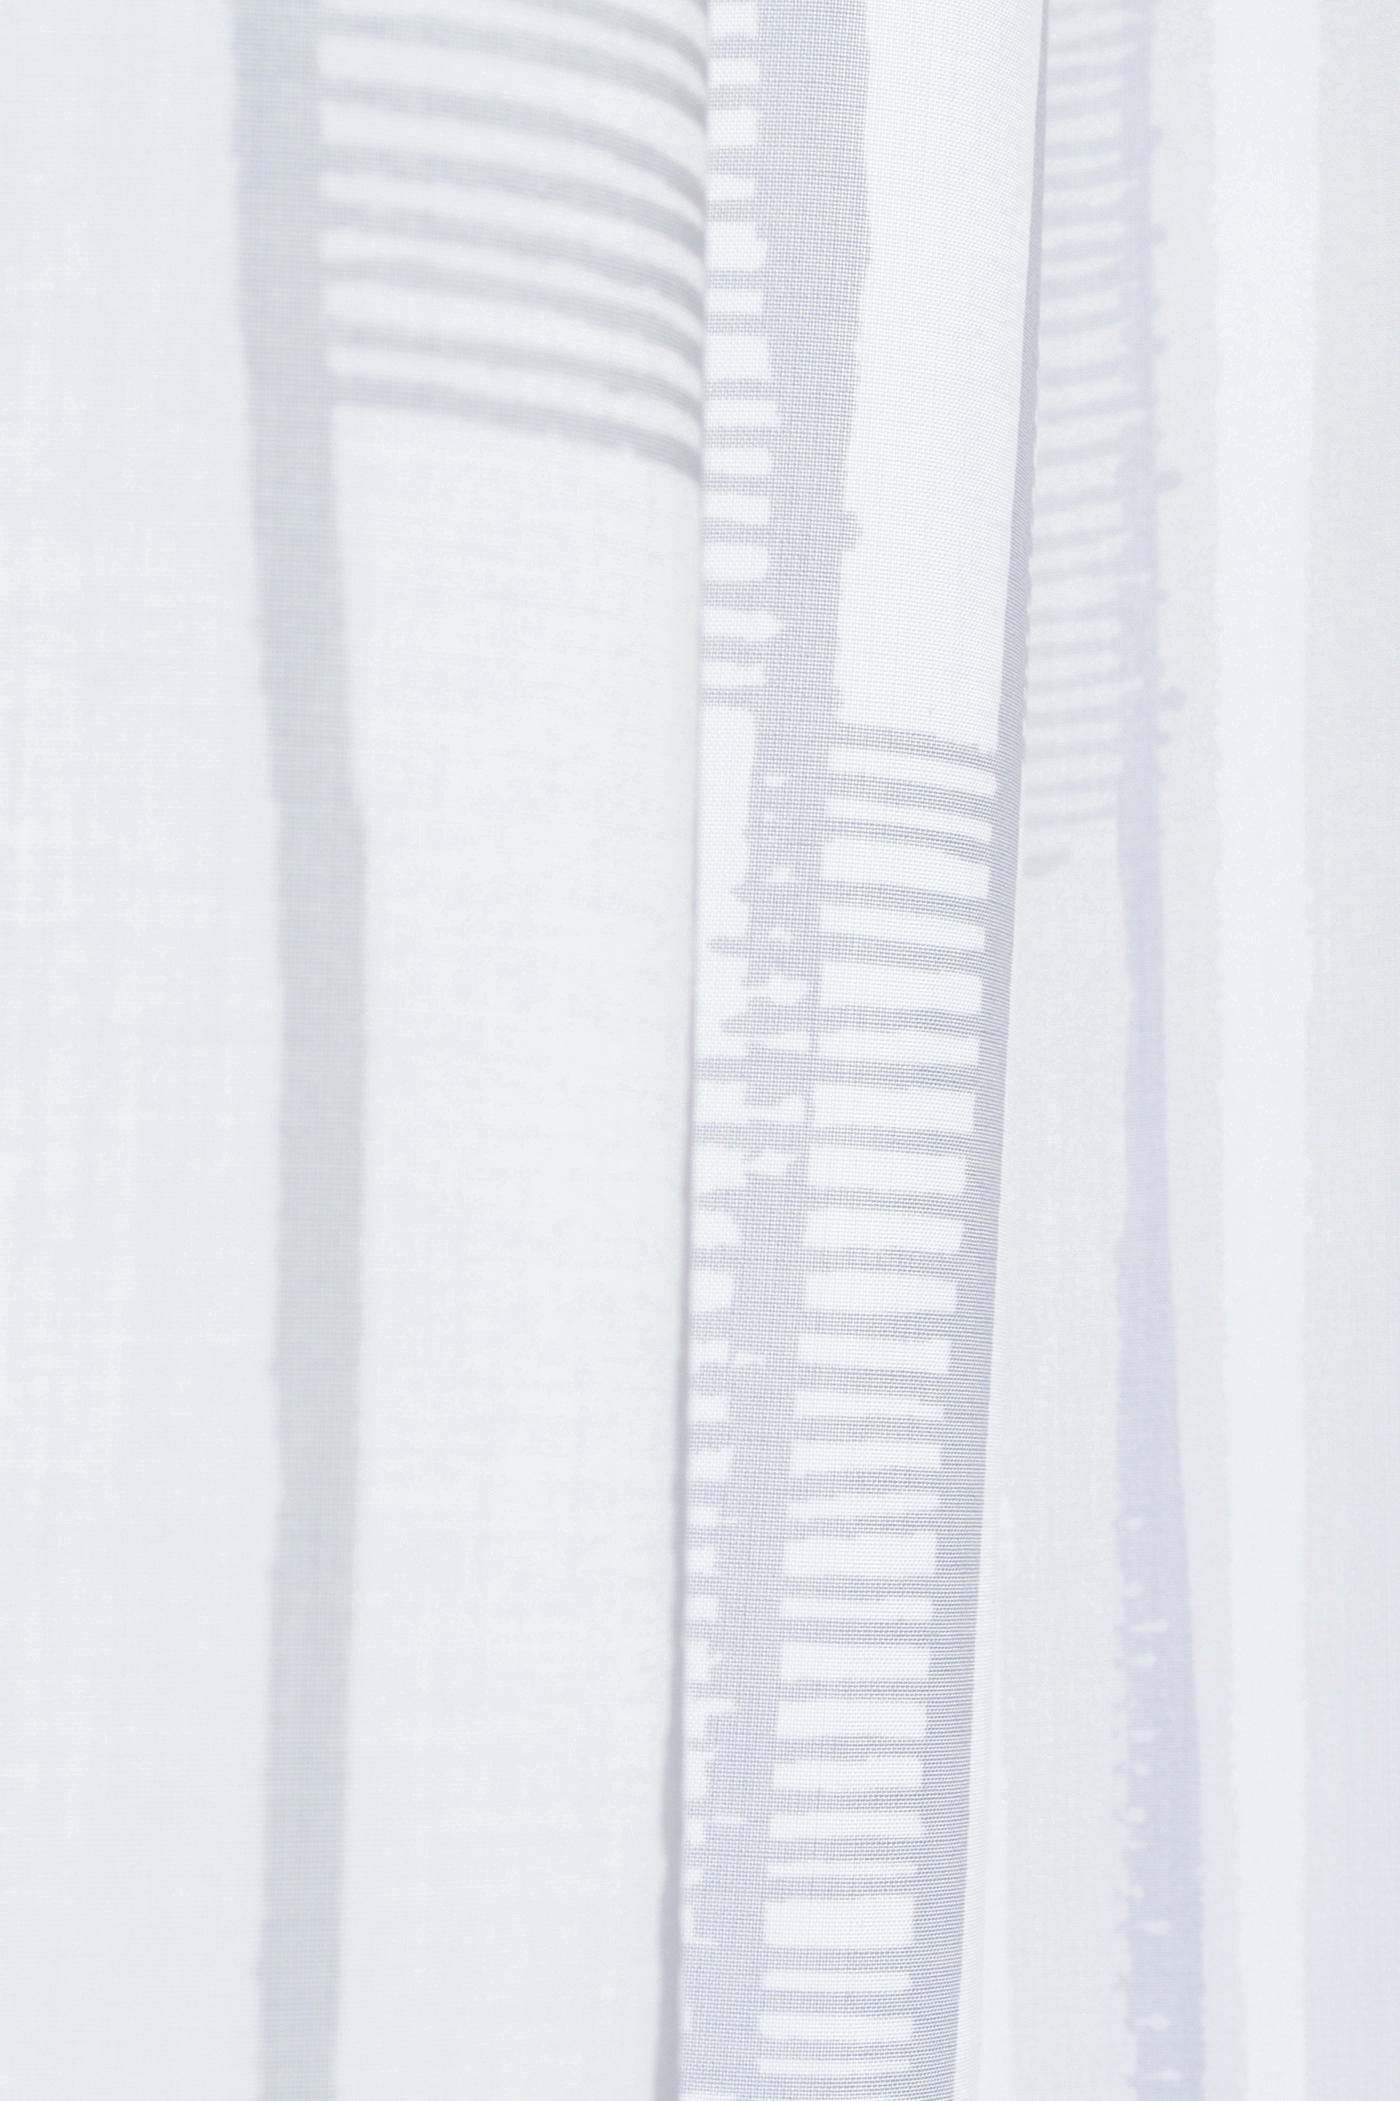 Lejdaren 1500-810